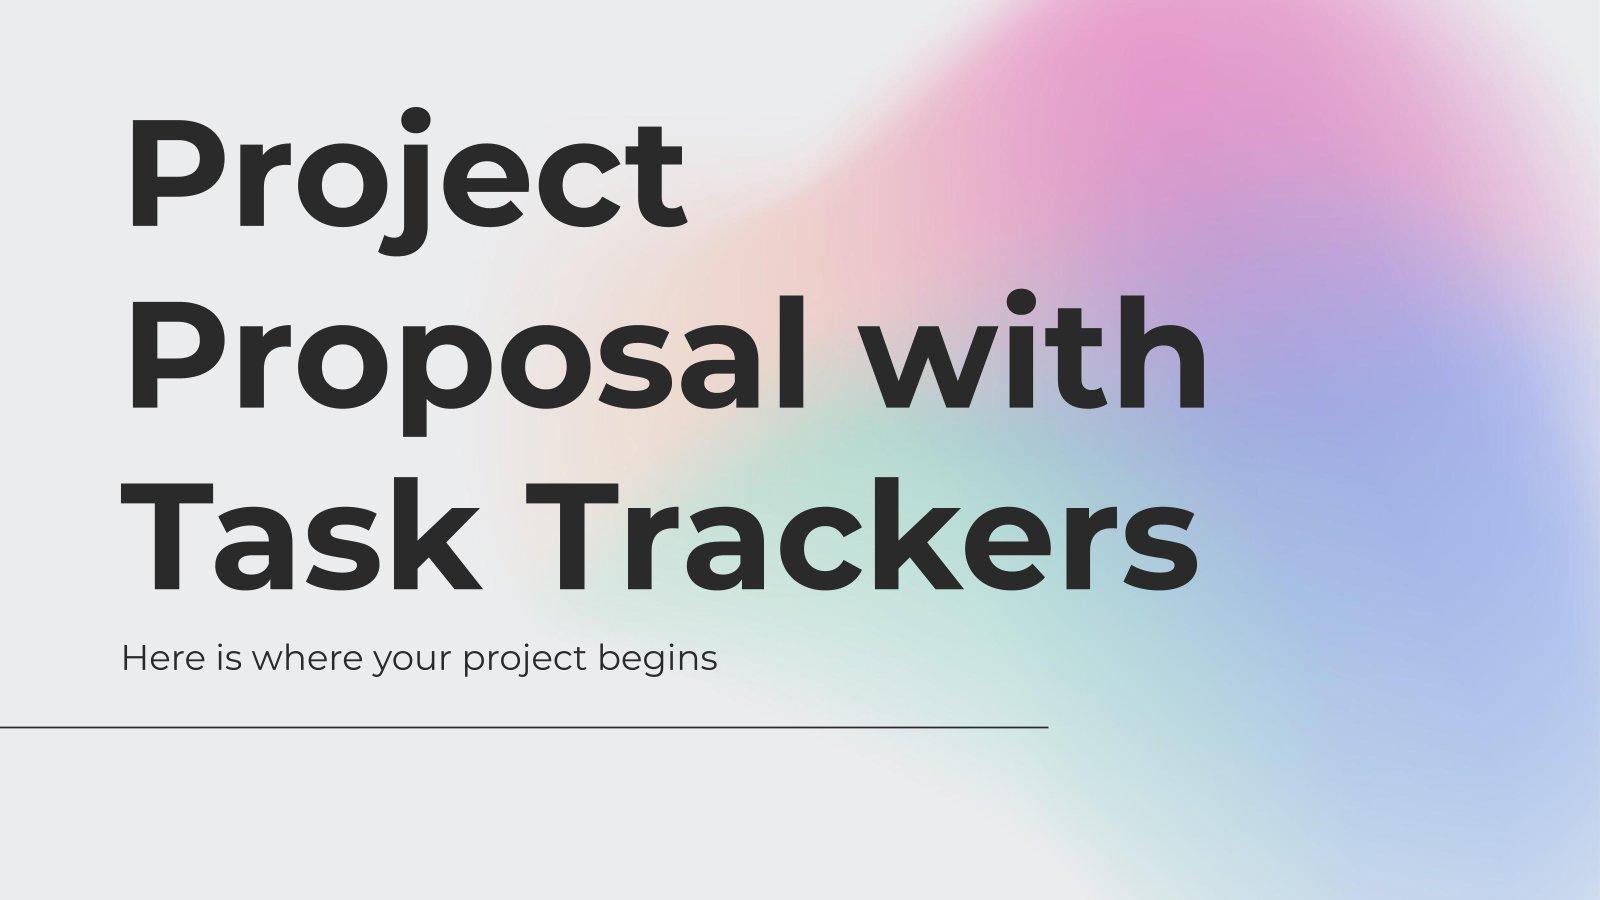 Projektvorschlag mit Task Tracker Präsentationsvorlage